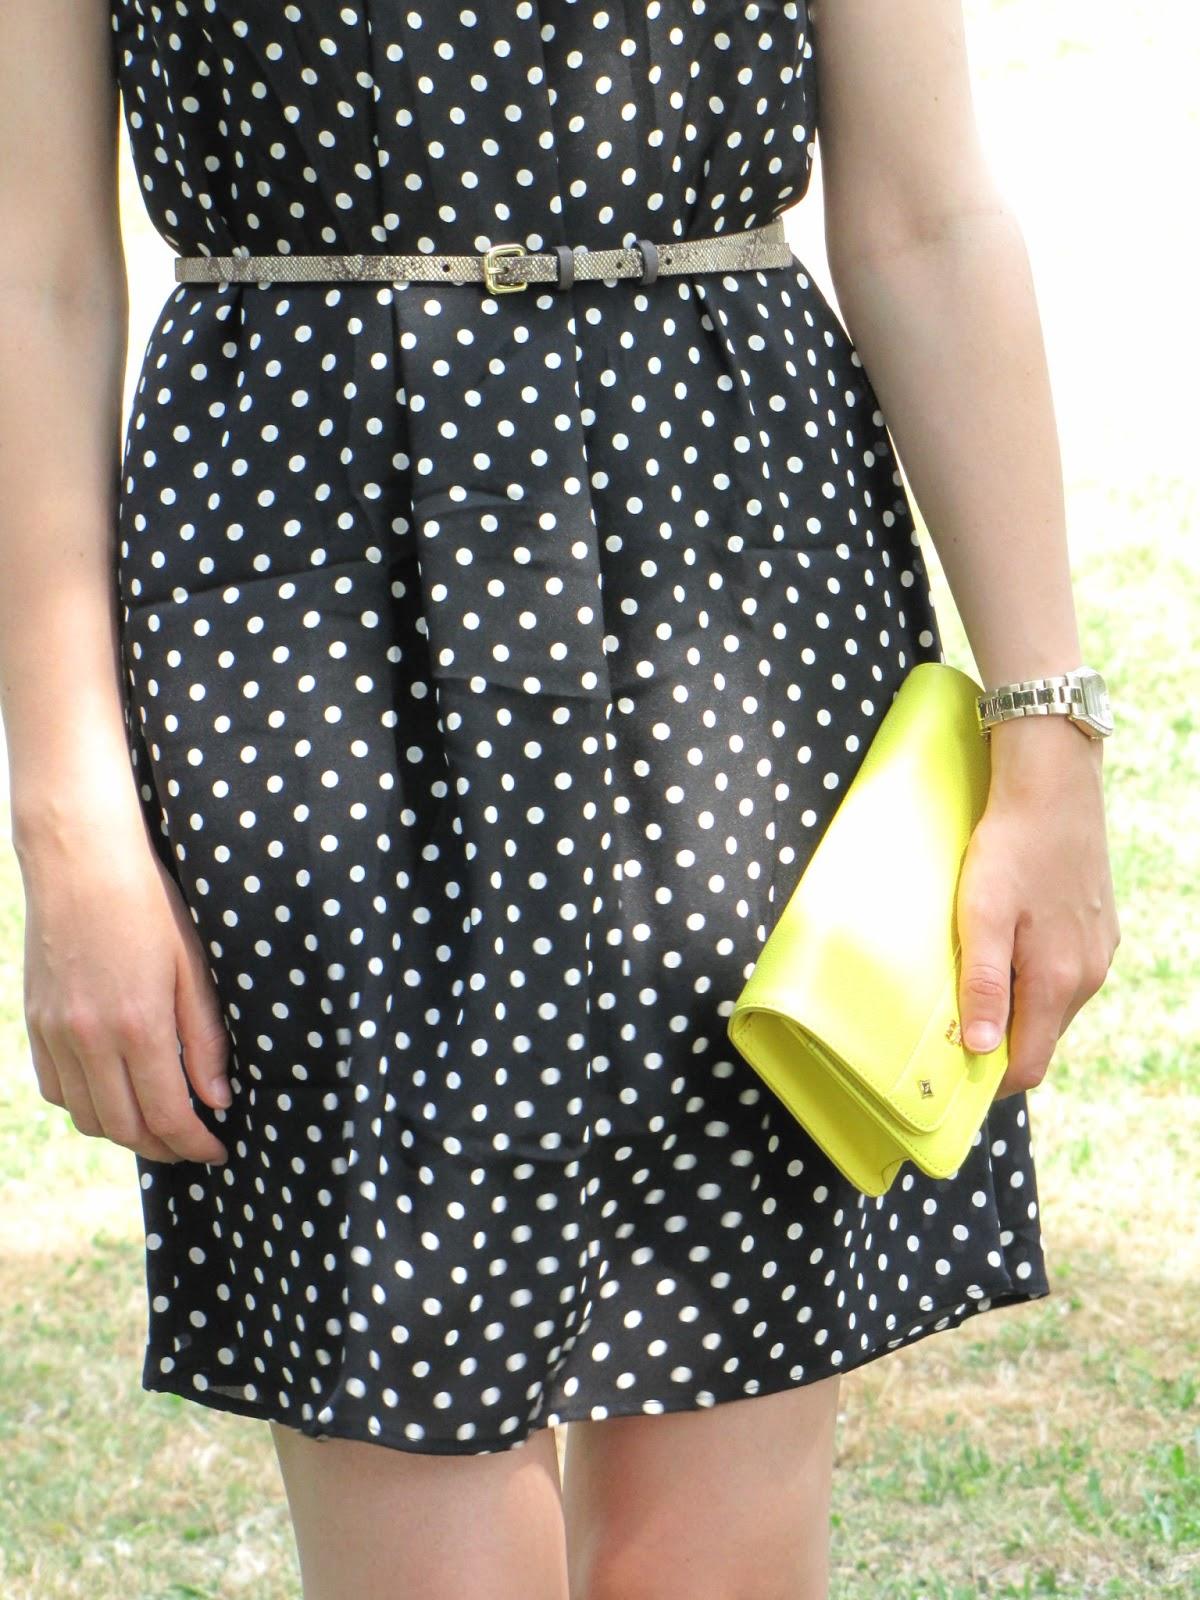 Mango dress, MCM bag